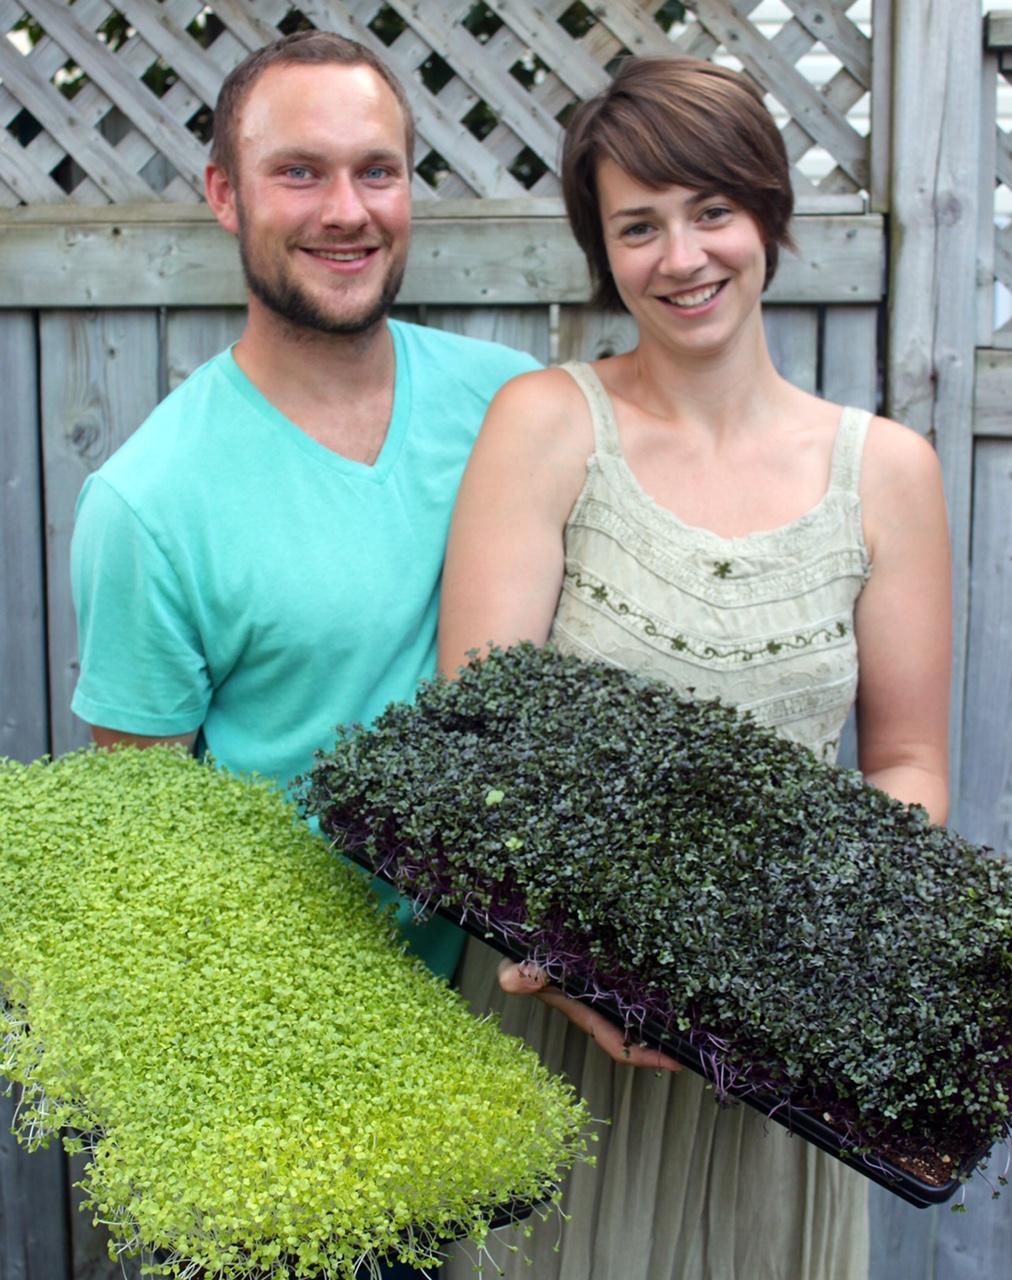 Seedling Microgreens